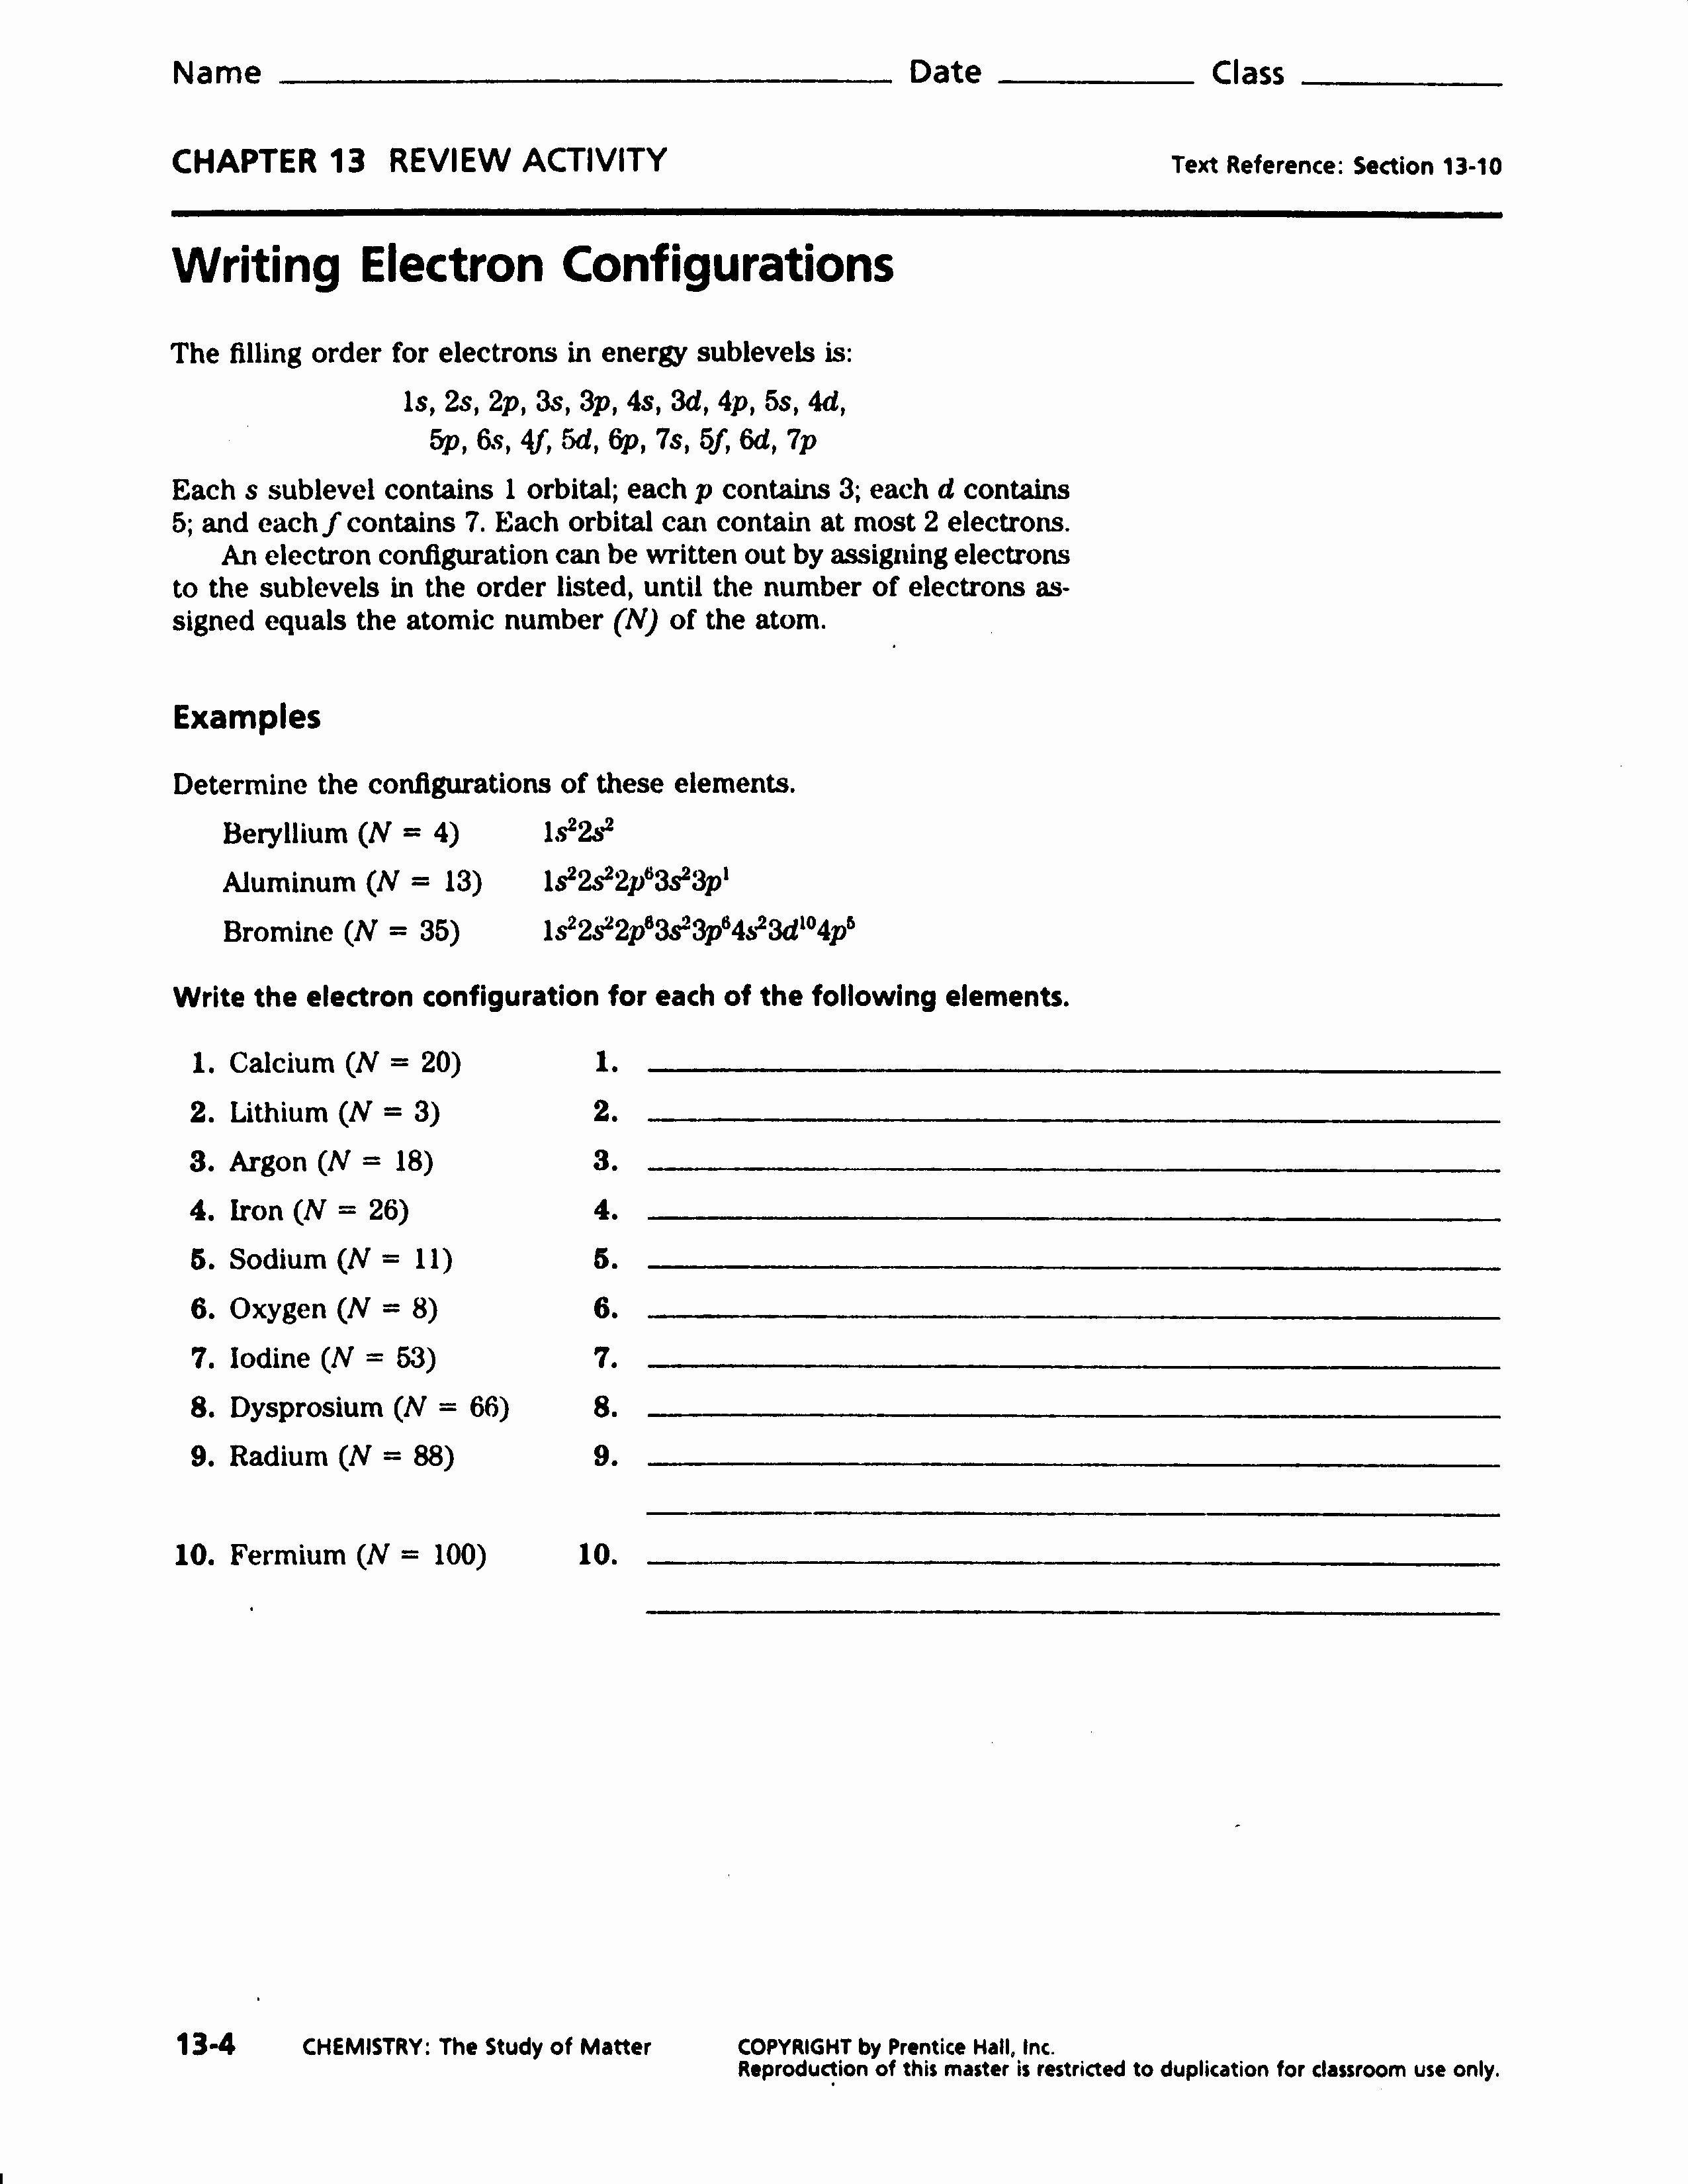 Electron Configuration Worksheet Answers Key New Electron